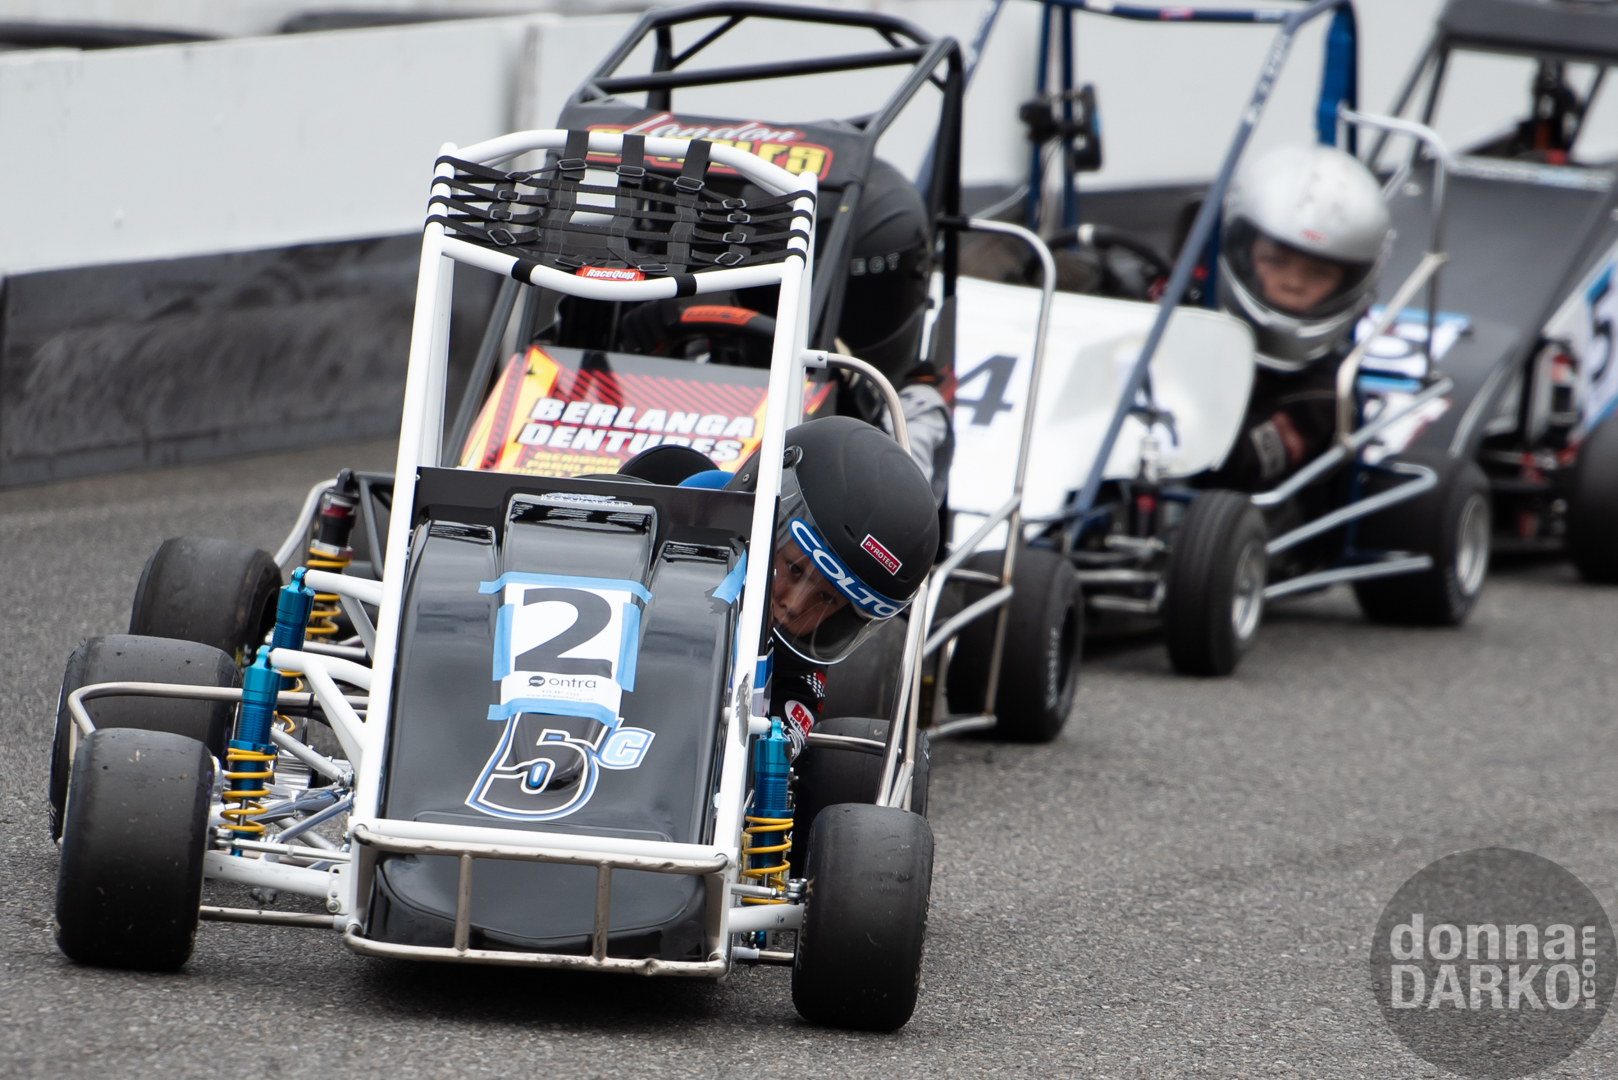 QWMA (Racing) 8-11-2019 DSC_6839.jpg